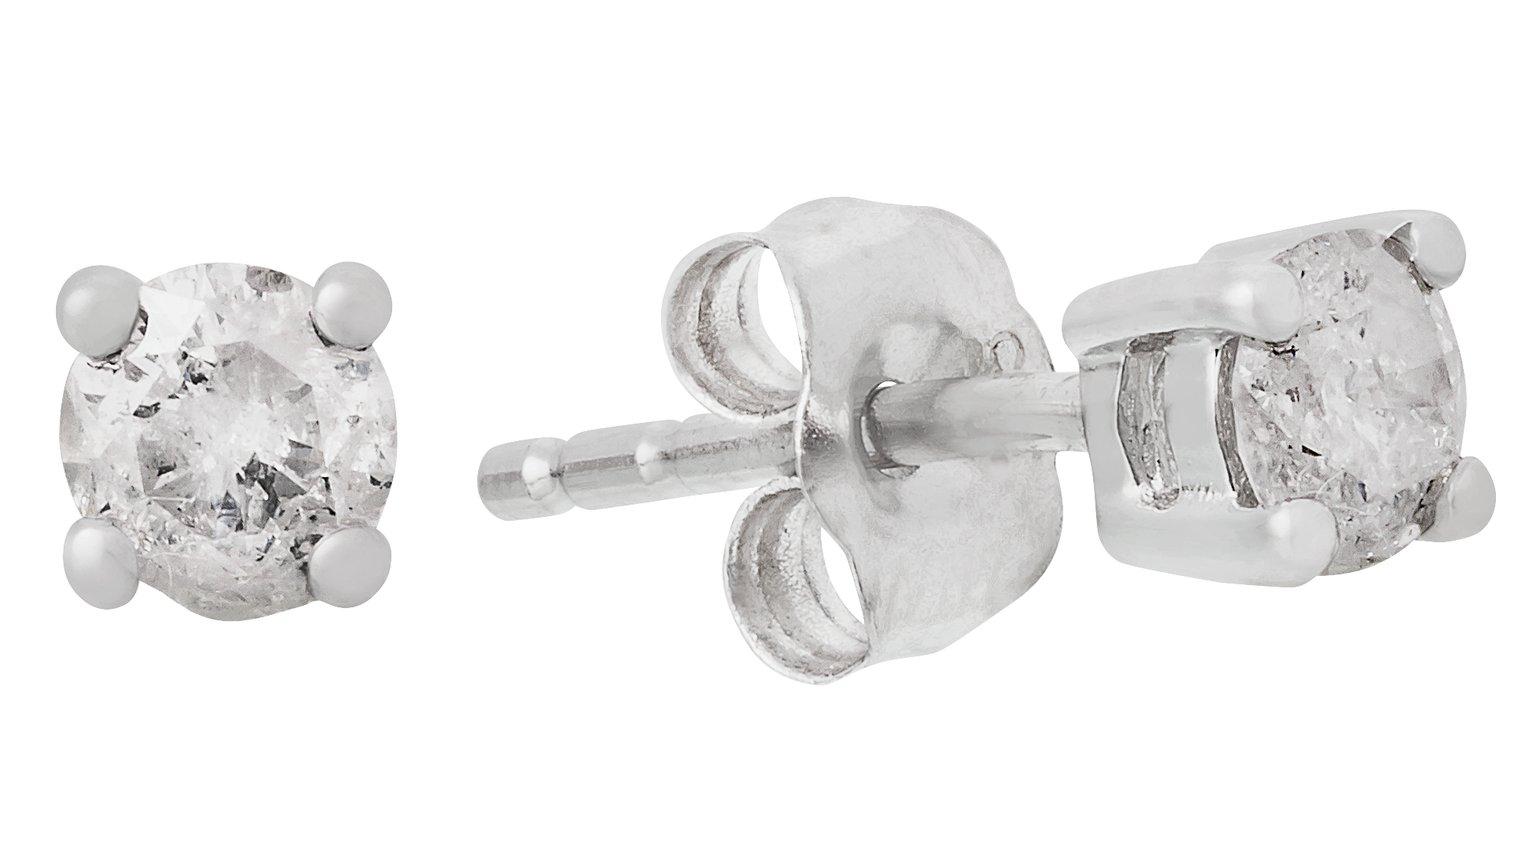 9 Carat White Gold - 0.25 Carat Diamond Solitaire - Stud Earrings.